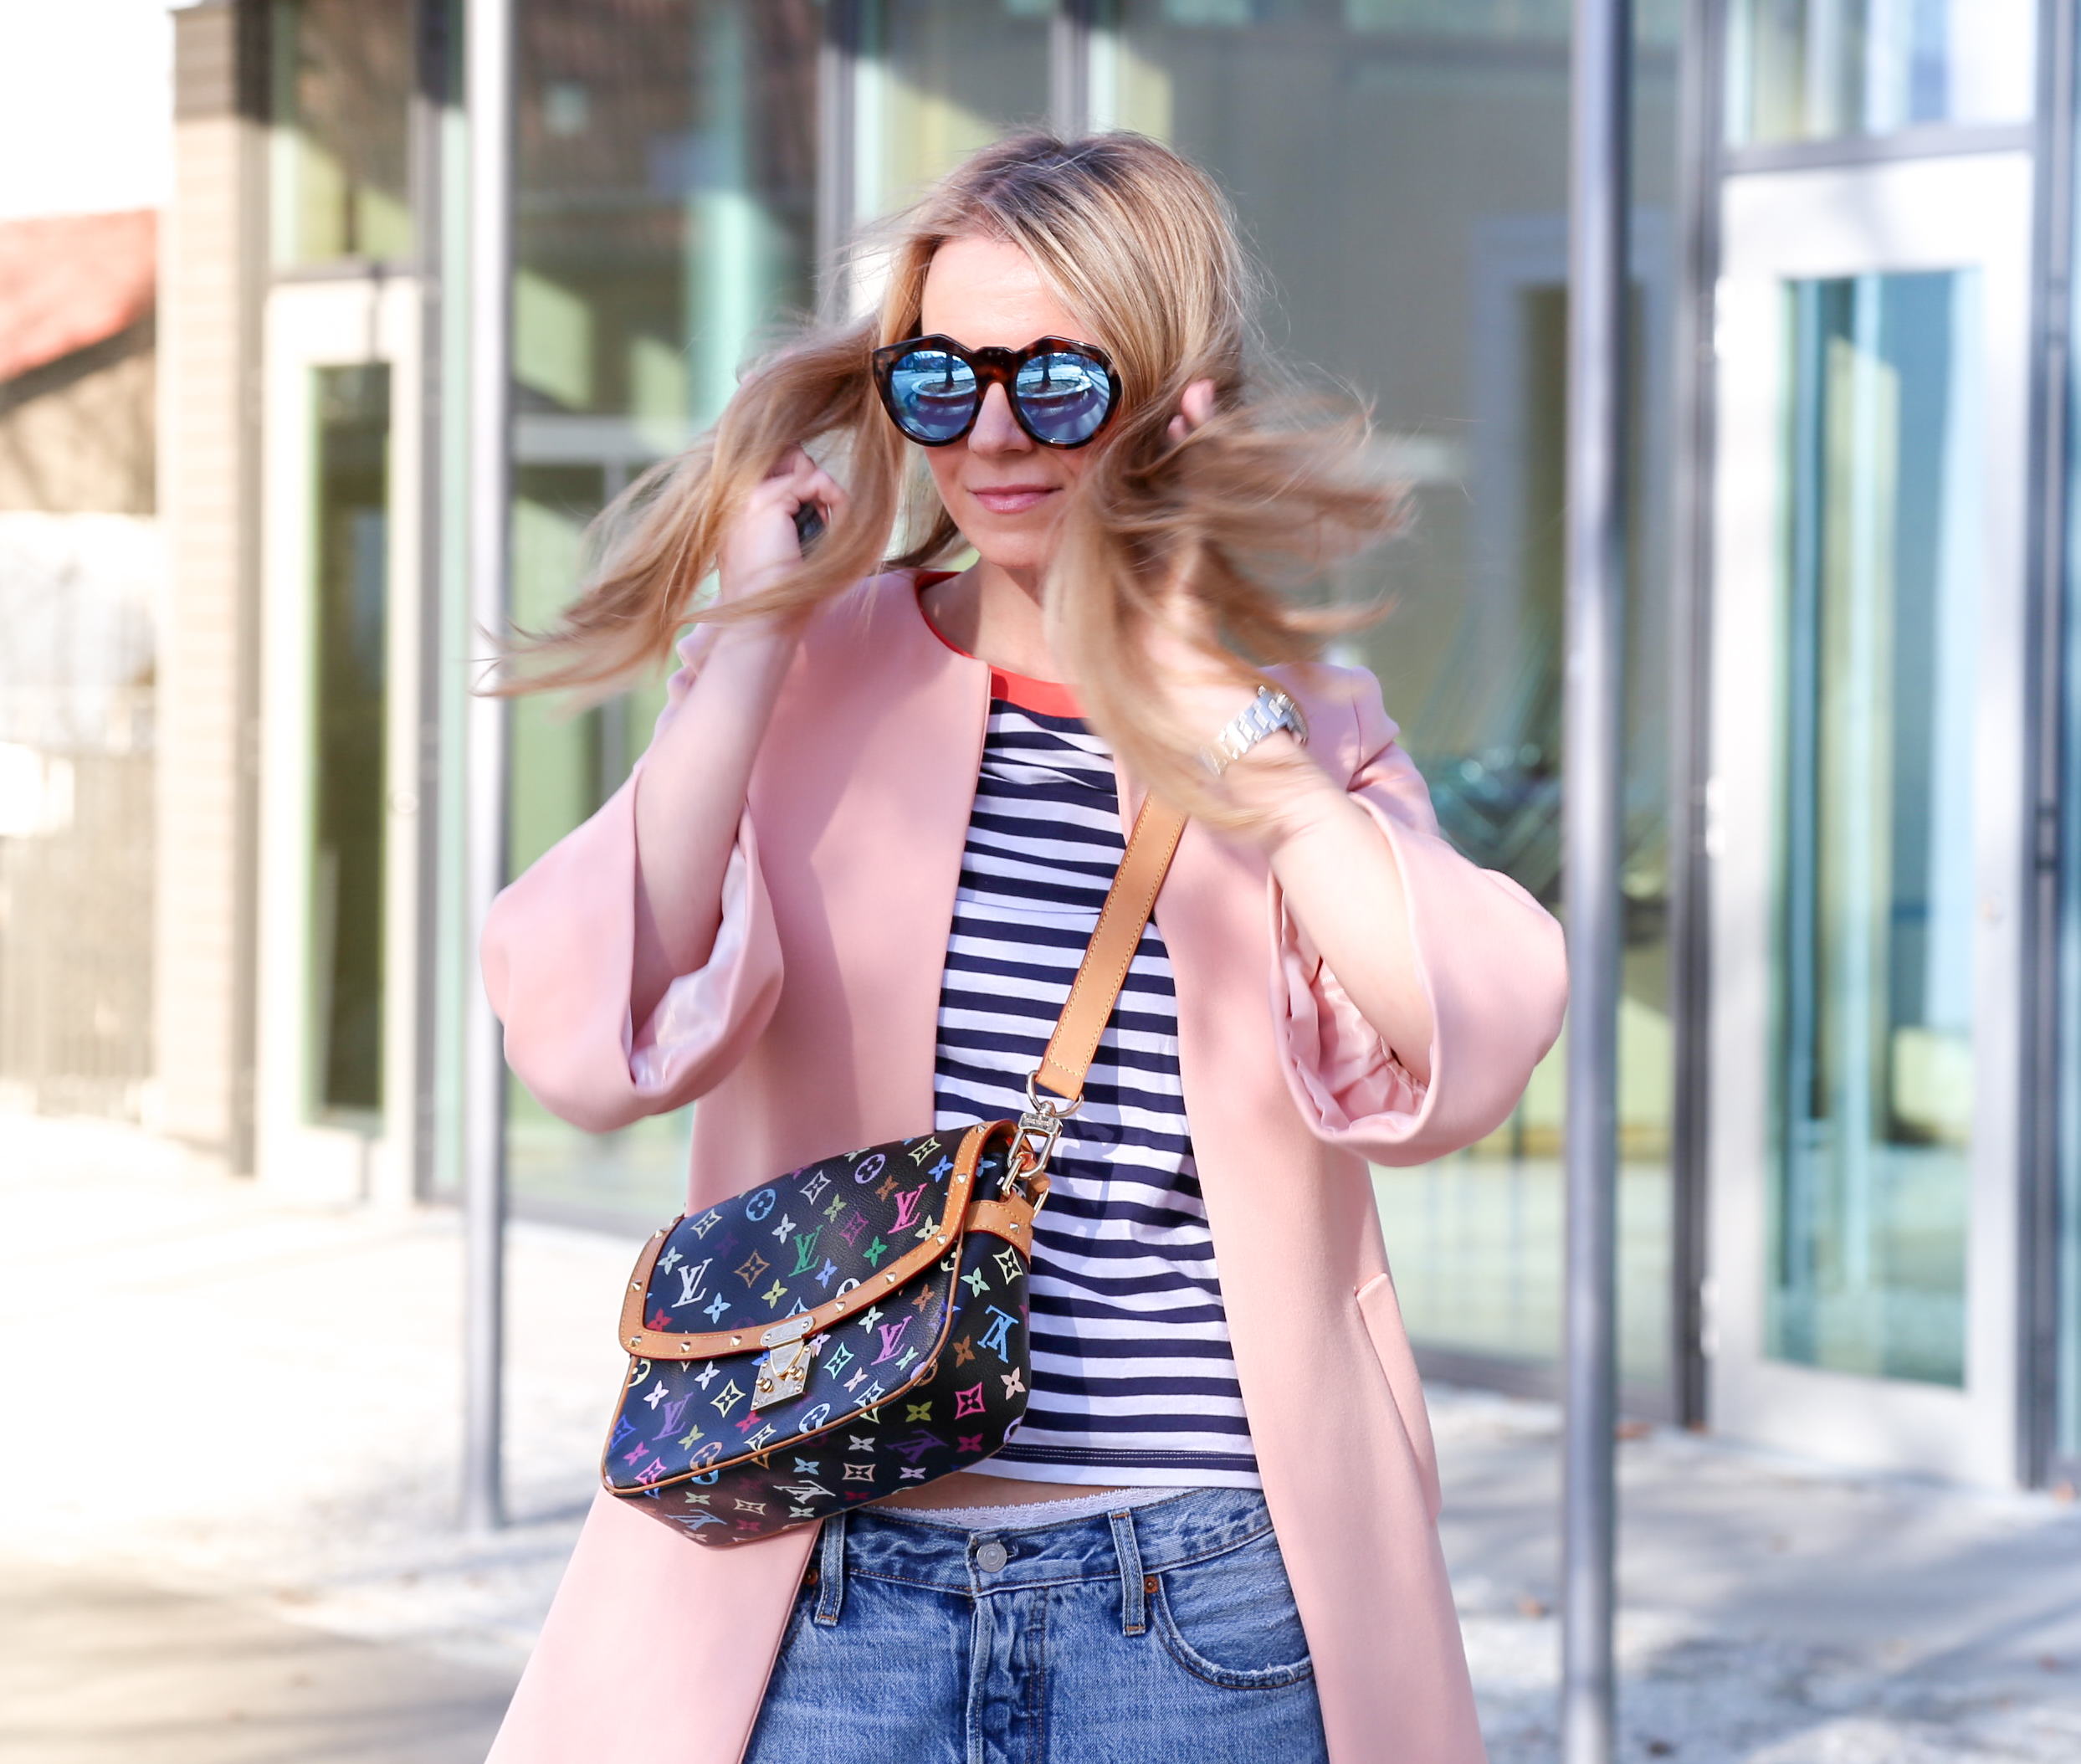 Frühlingsoutfit in Rosa mit Denim und Streifenshirt Jeans Denim Brille LeSpecs LouisVuitton Jennifer PepperAndGold LV LVOE Taschen Bags Fashion Mode Chucks Converse Outfit Frühling